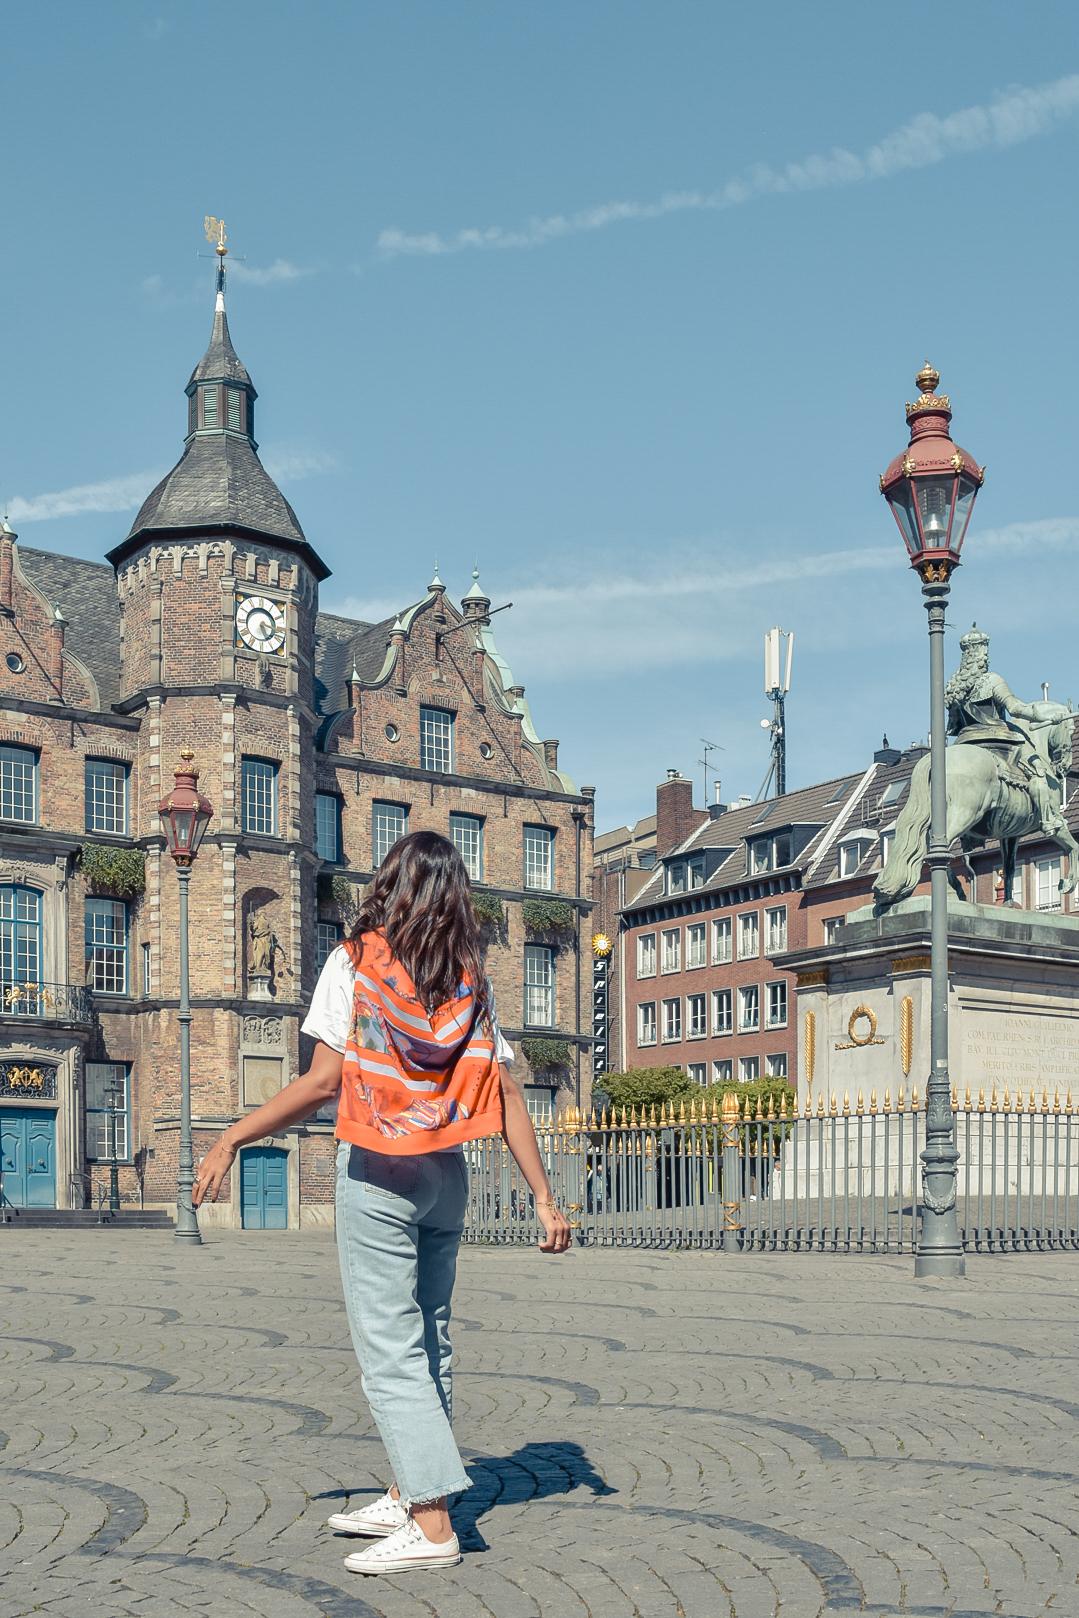 el-blog-de-silvia-viajar-dusseldorf-jersey-geometrico-jeans-levis-04